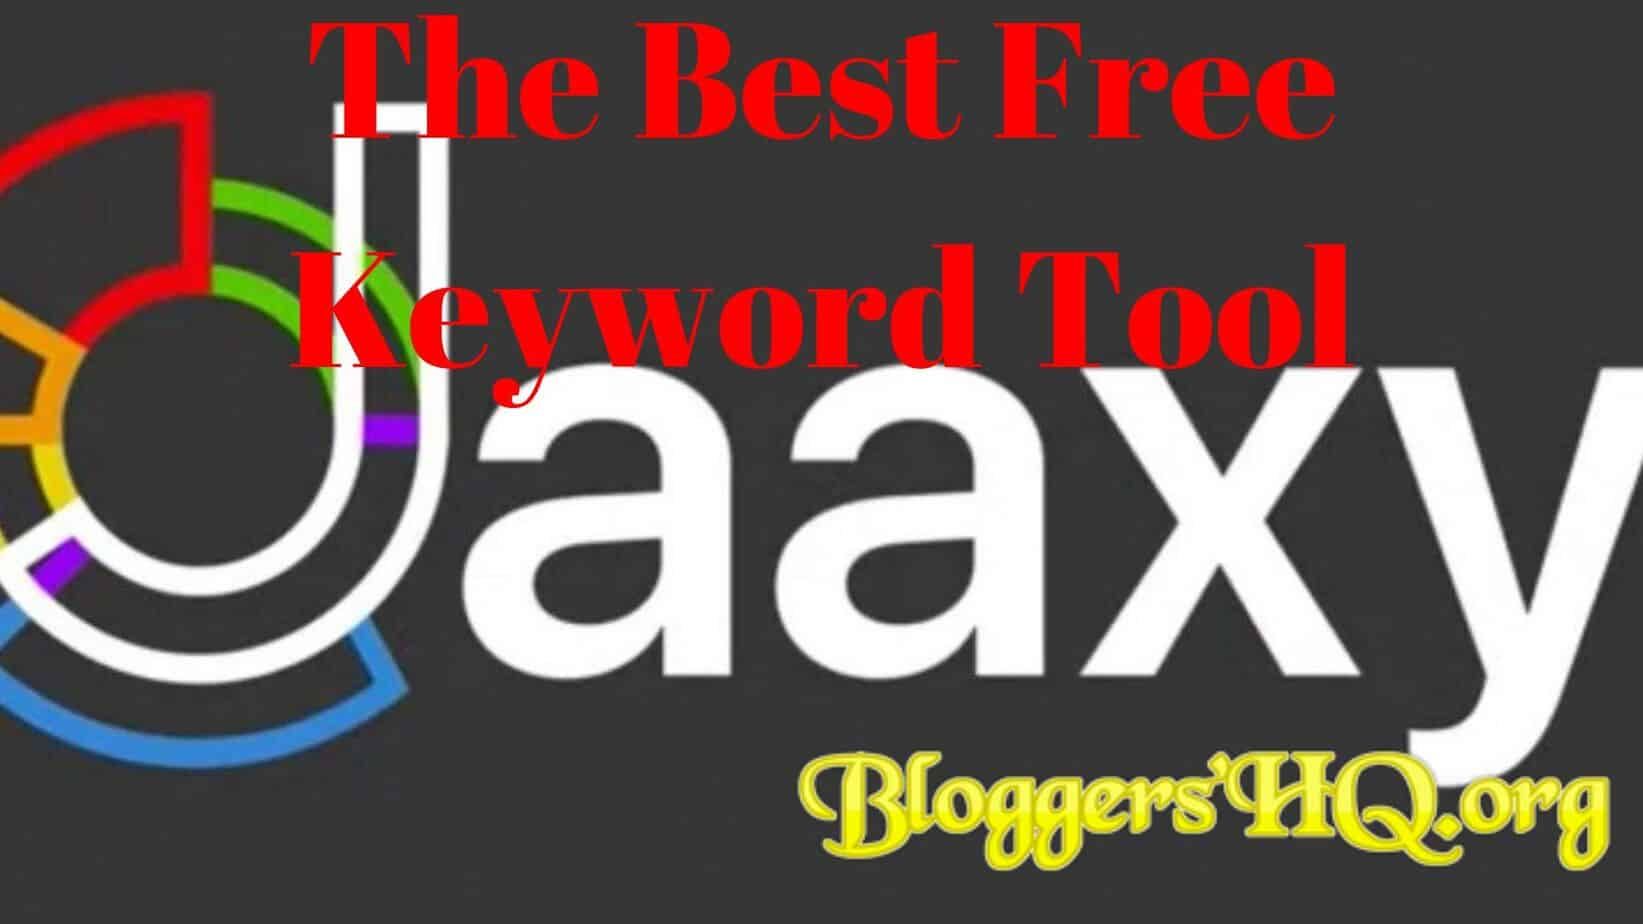 The Best Free Keyword Tool